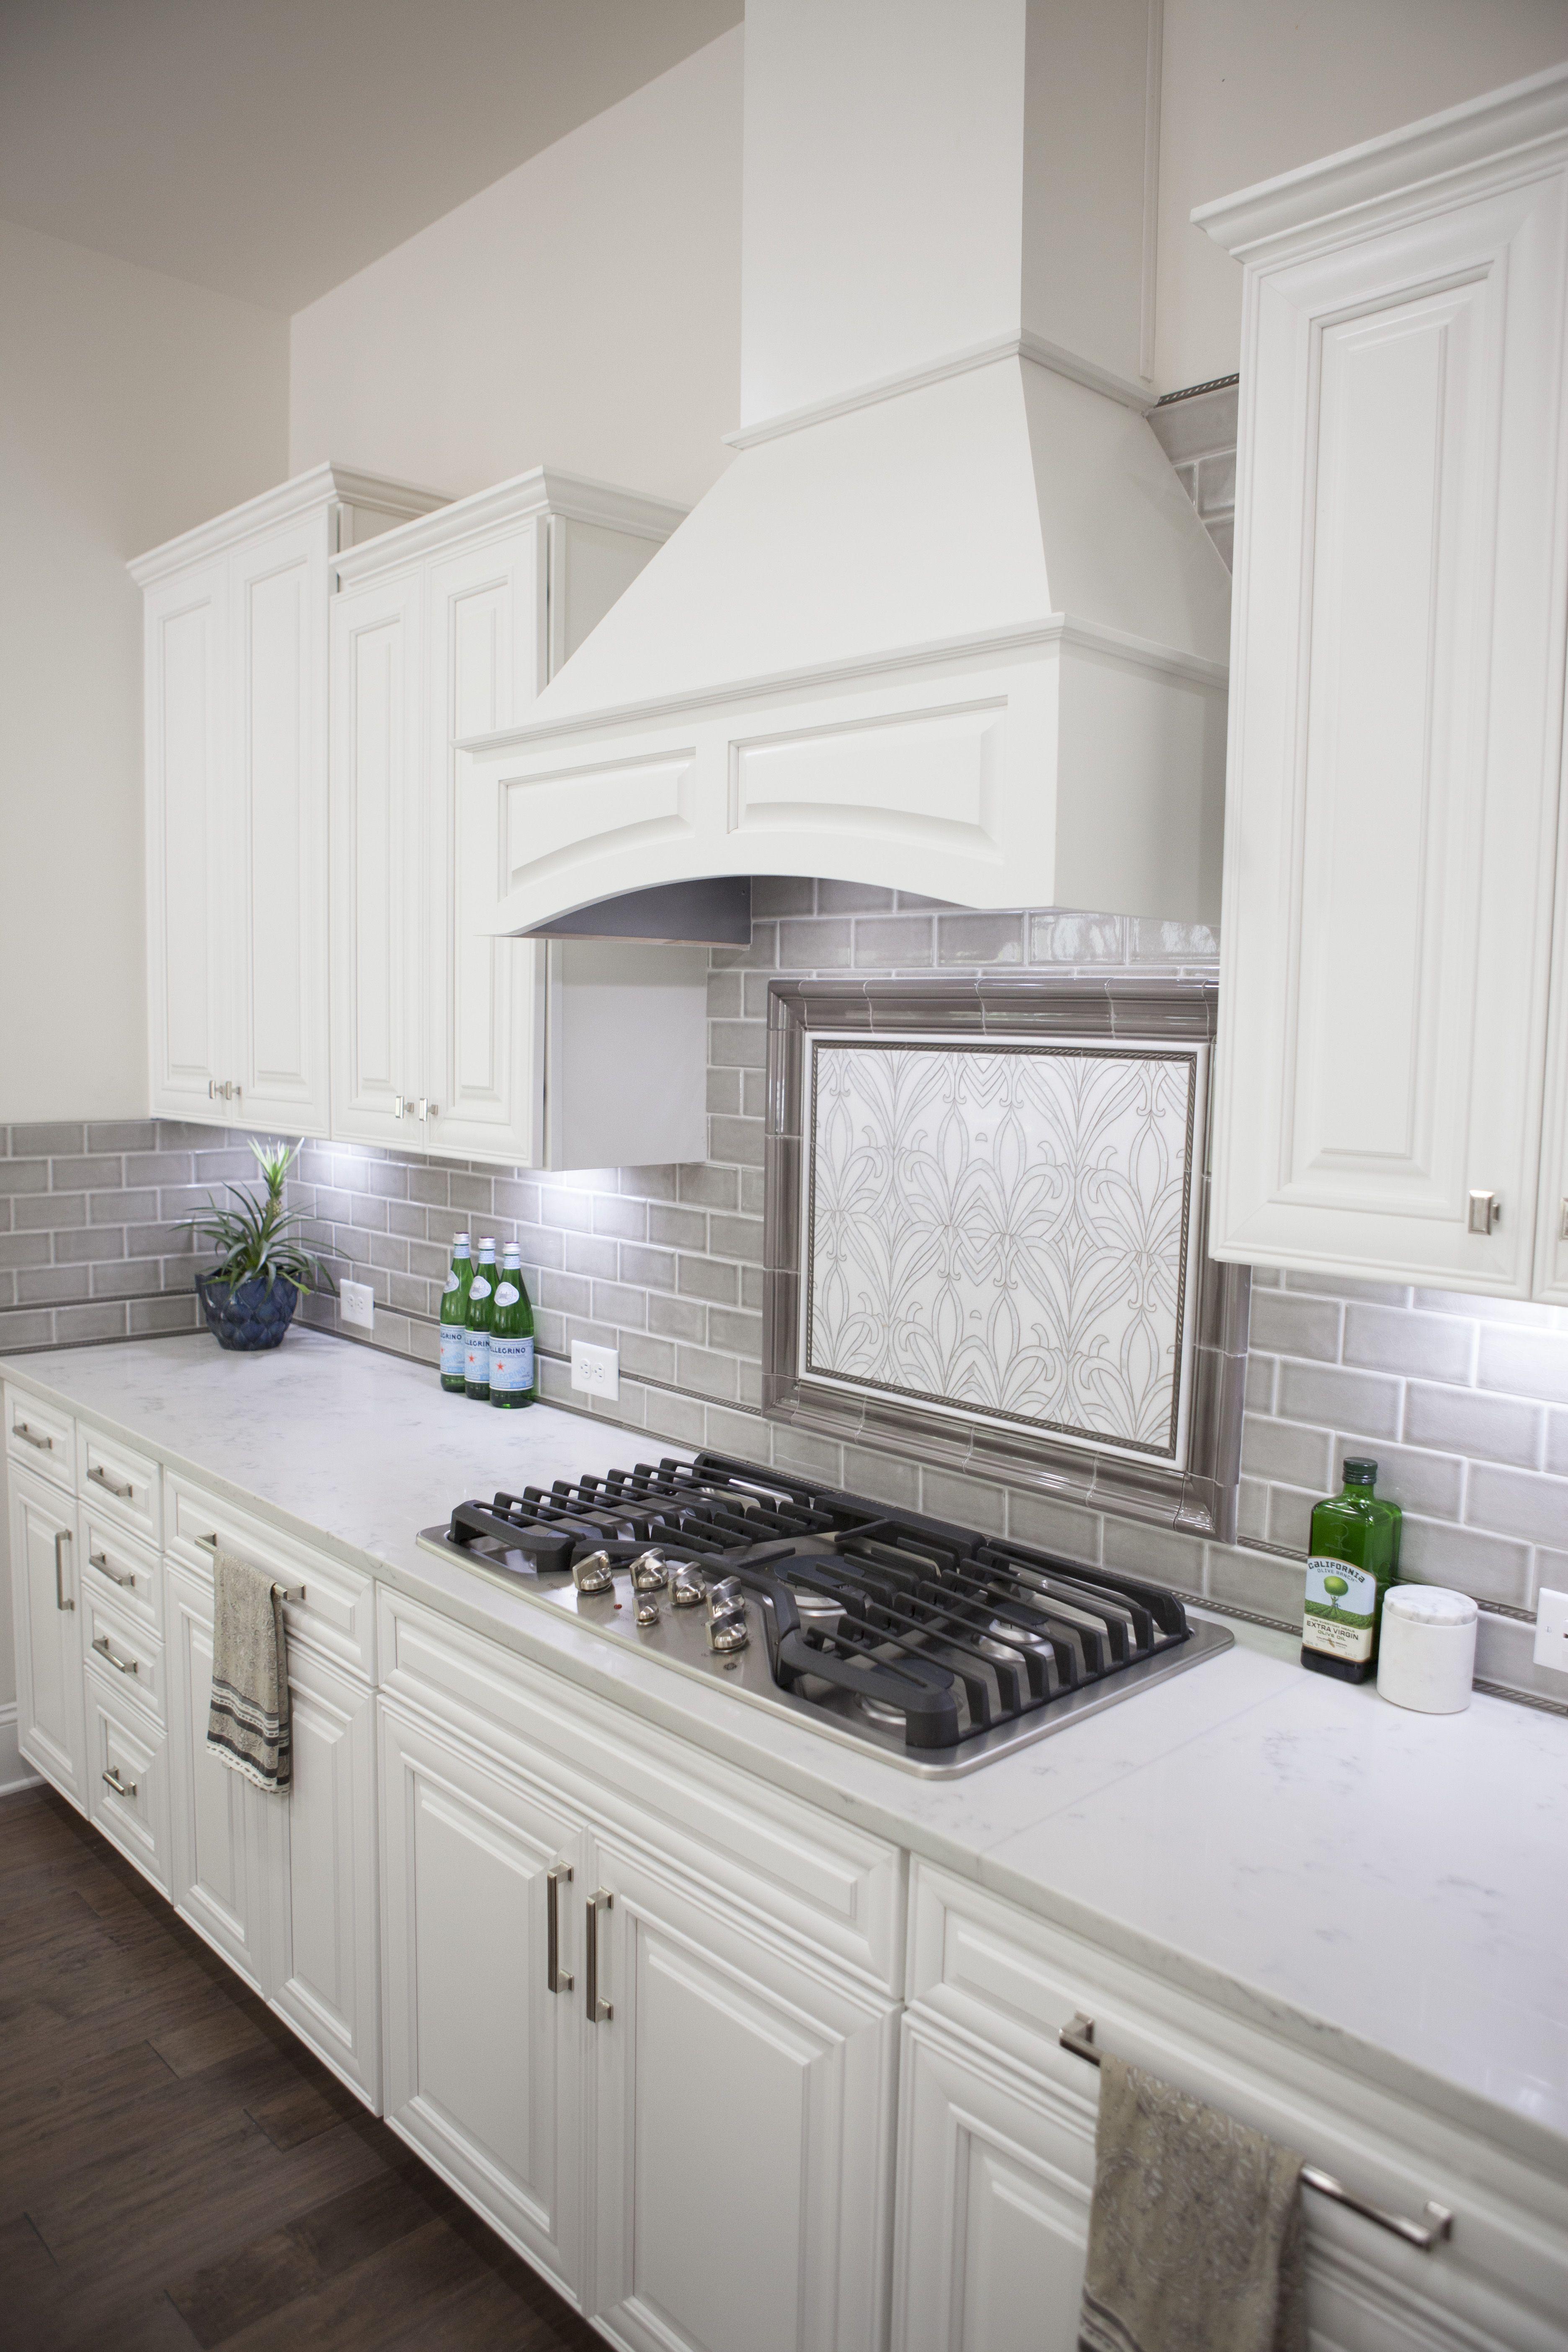 - Taylor Morrison Rochester Kitchen With Custom Backsplash